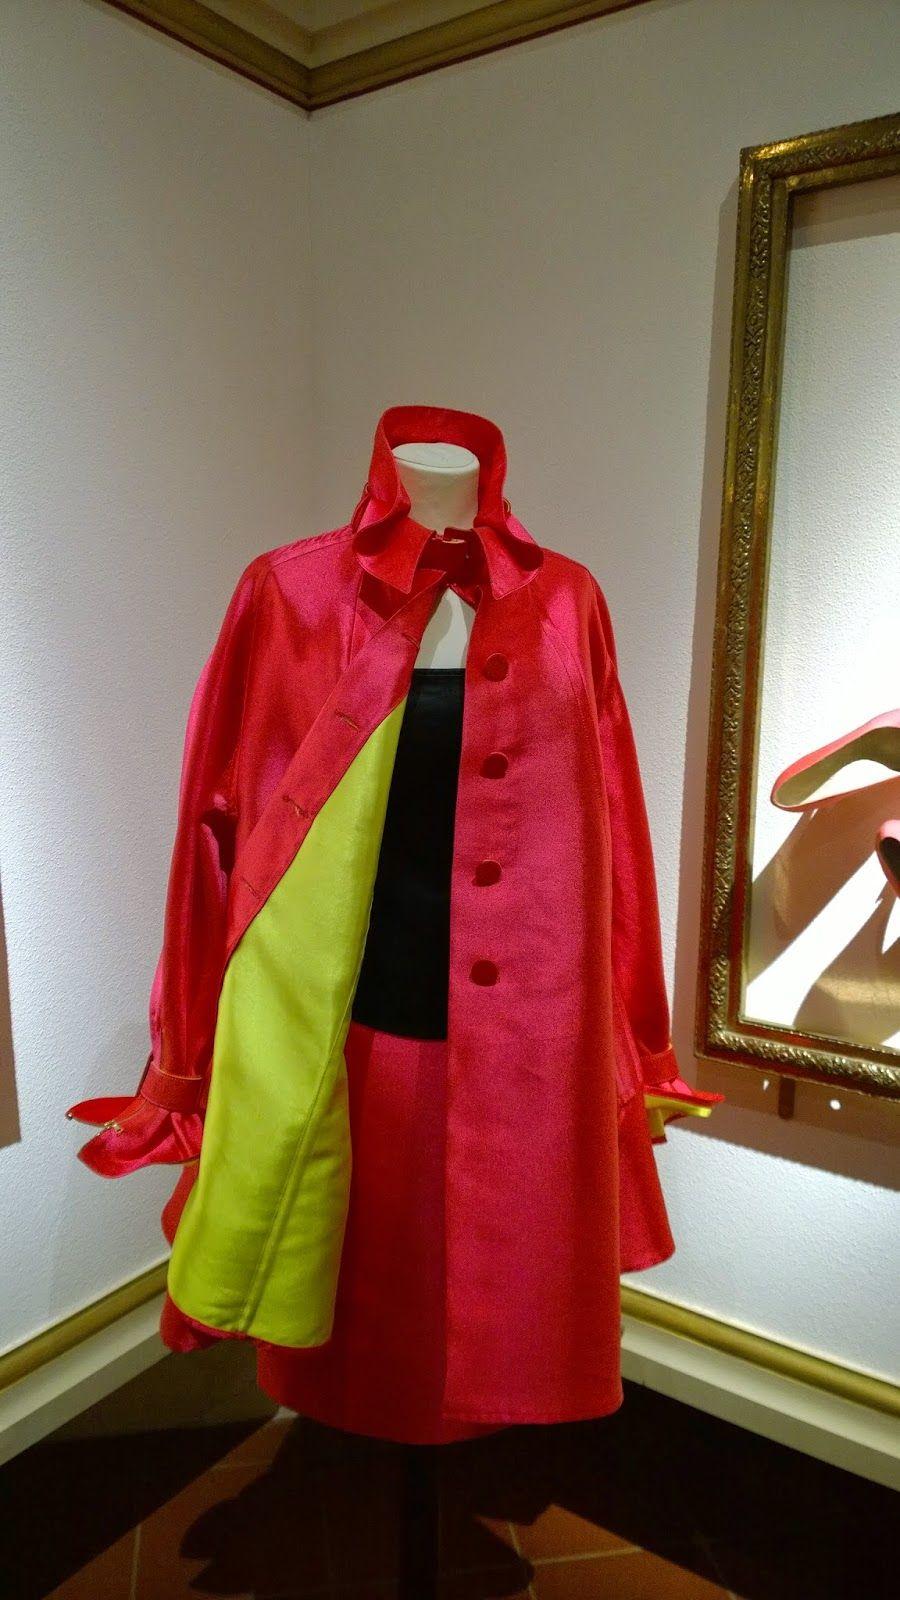 Pink coat - Soprabito, Spolverino pink #fashion #vintage #gianfrancoferre